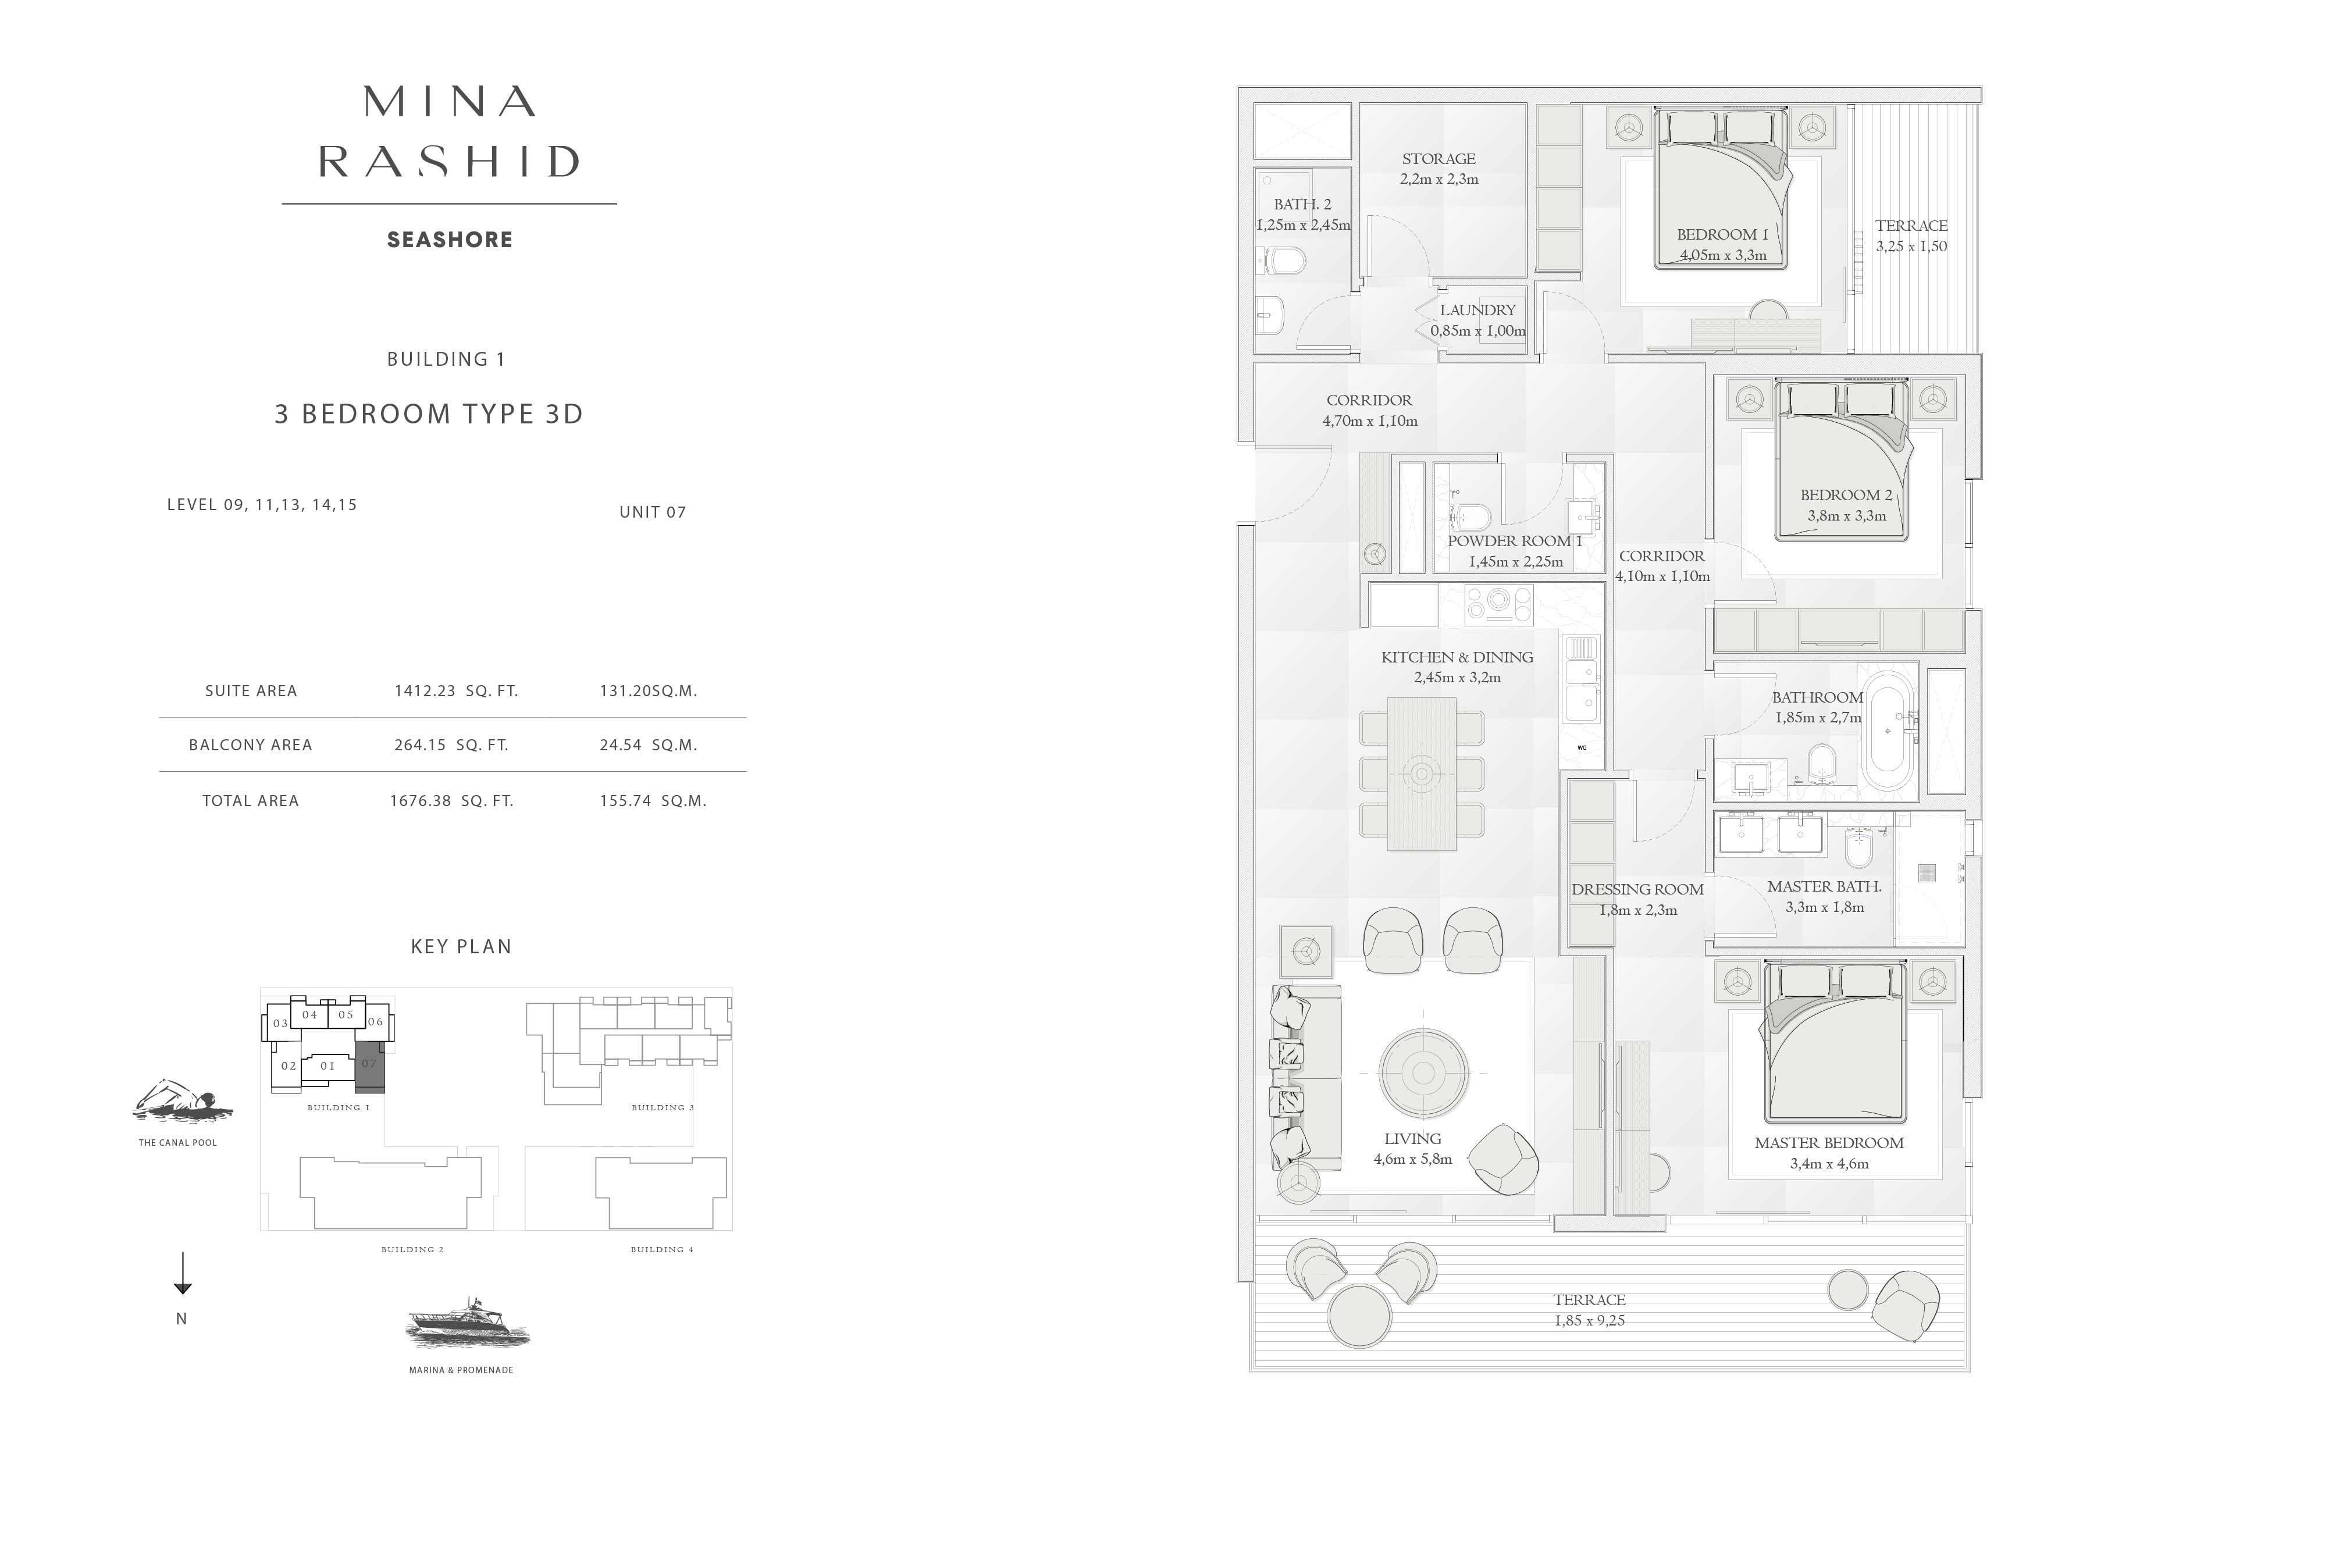 Building-1, 3-Bedroom Type-3D, Size-1676-Sq-Ft